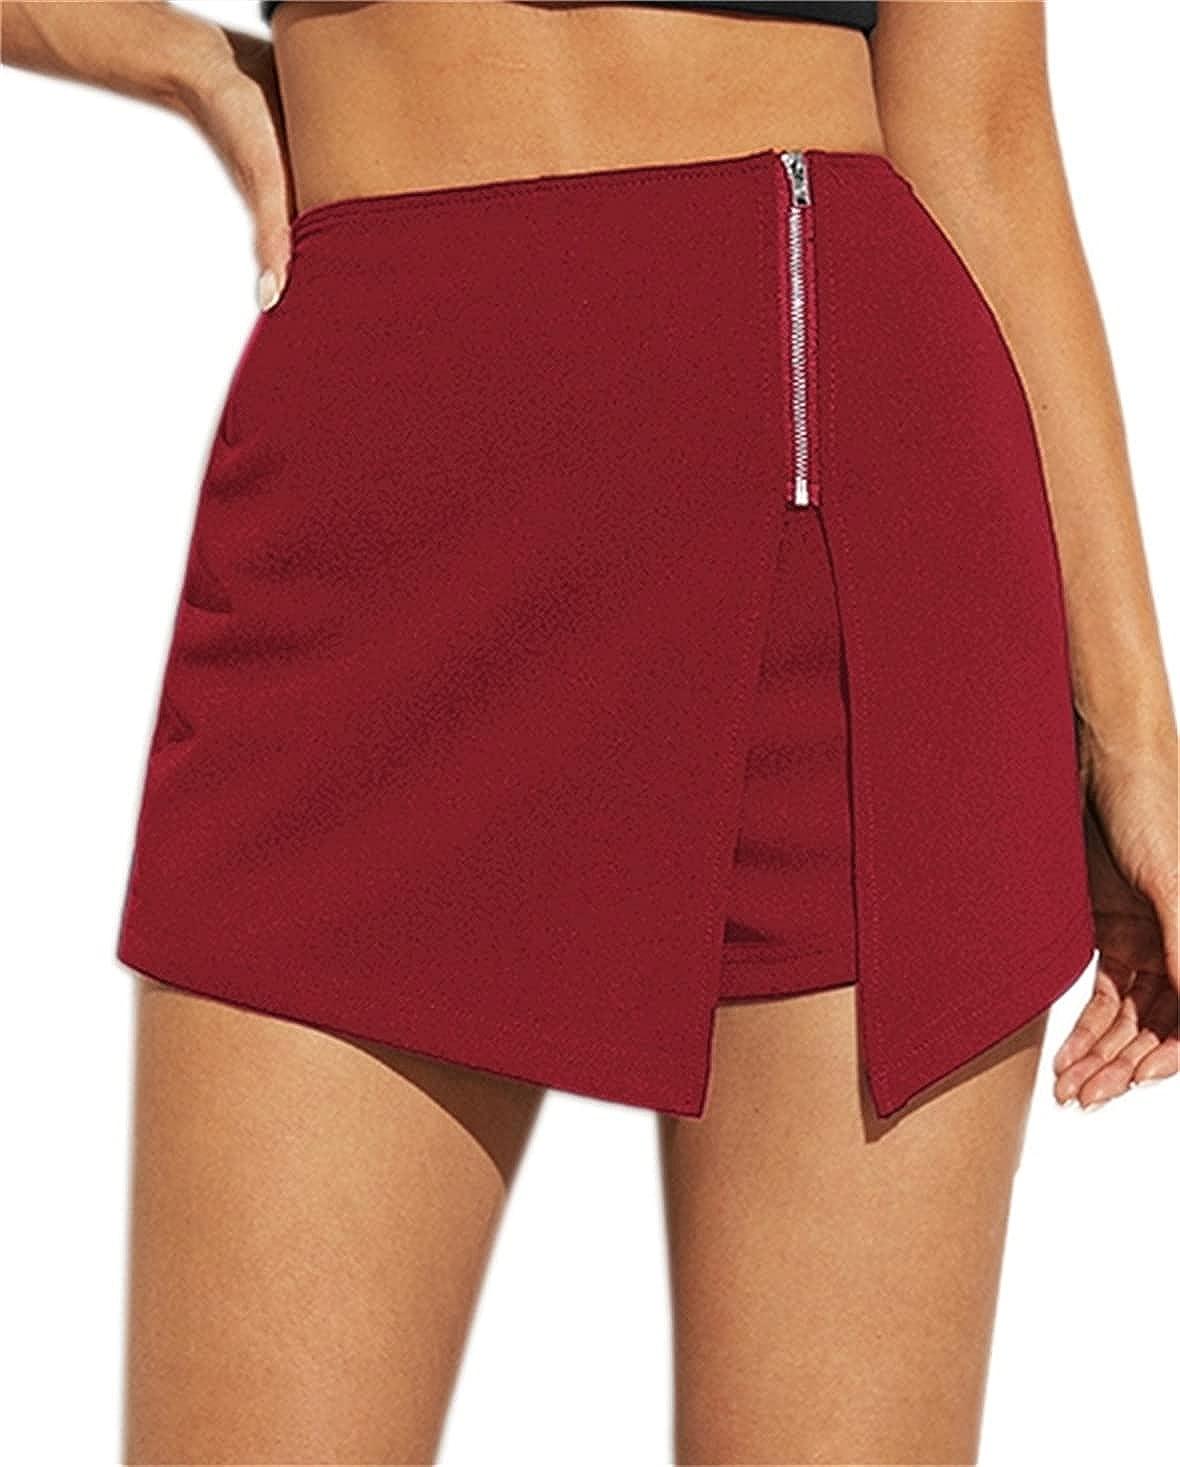 SheIn Women's Choice Zip Up Asymmetrical Special sale item with Split Hem Skirt Skorts